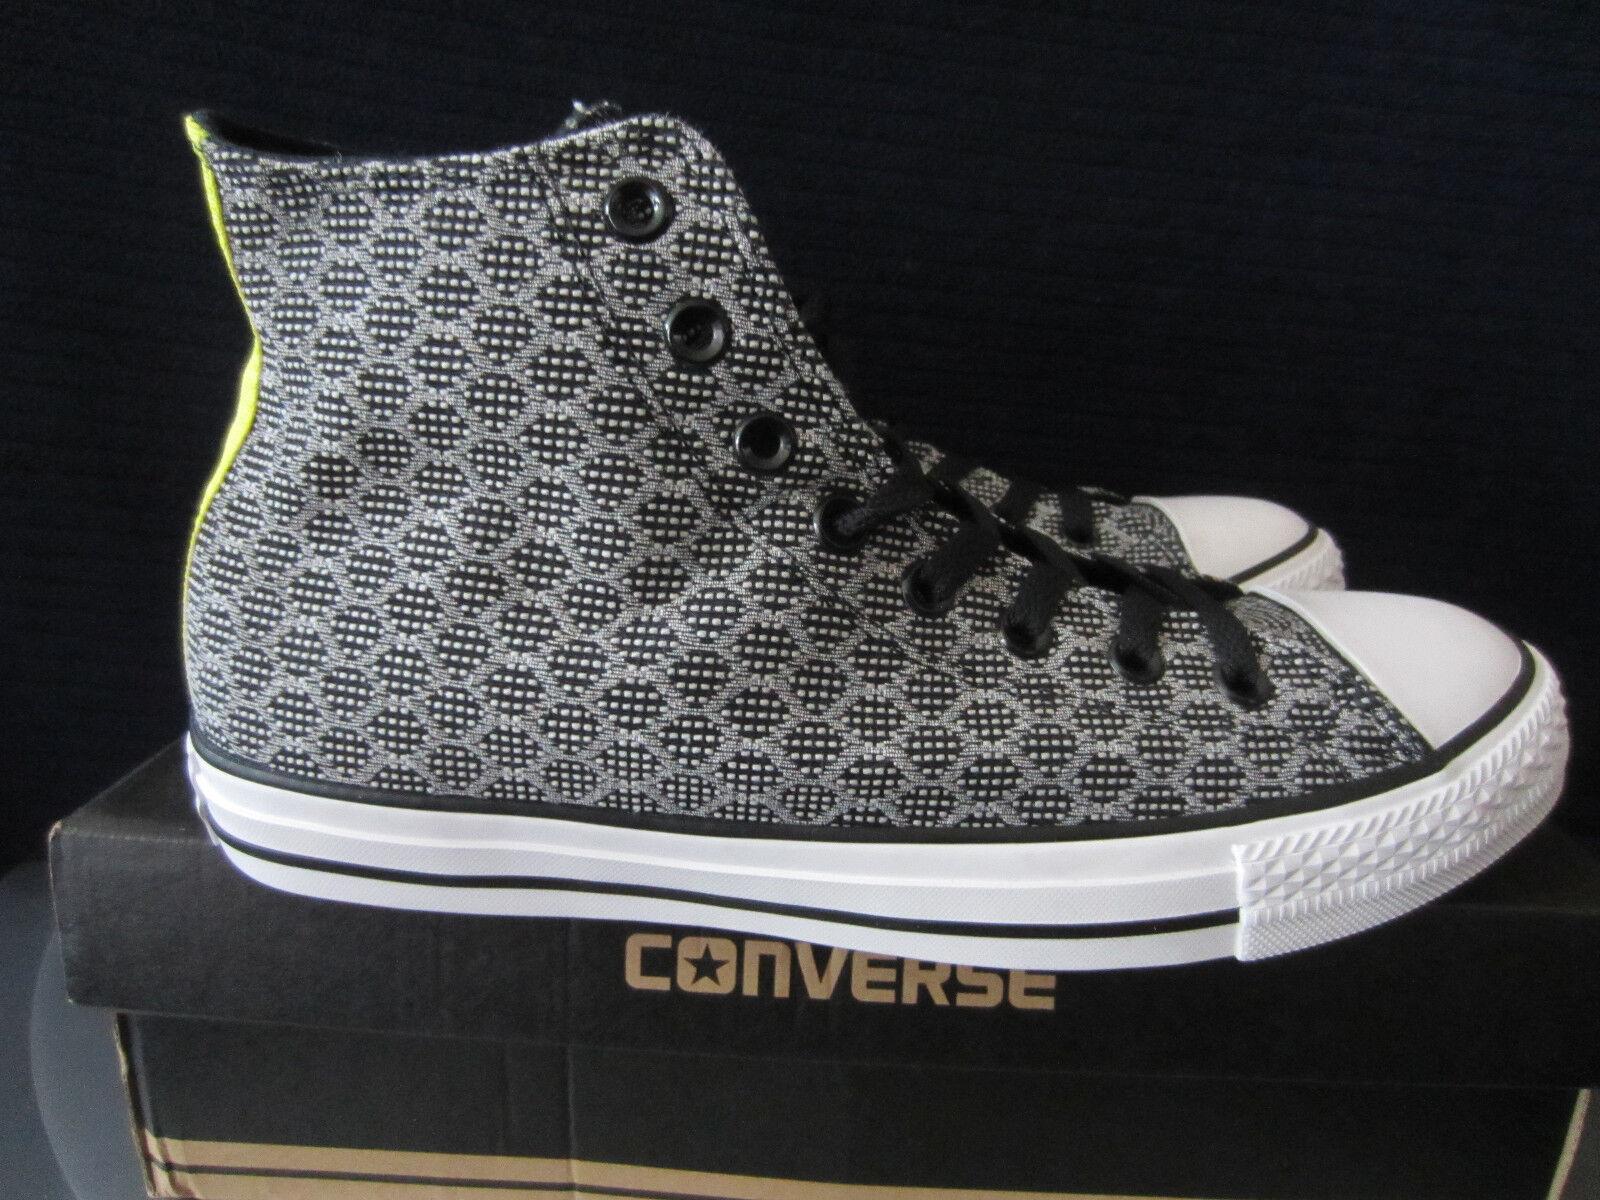 CONVERSE Chuck Taylor All Star Hi Jacquard 155436C Sneakers Grau Gr.42,5 NEU!